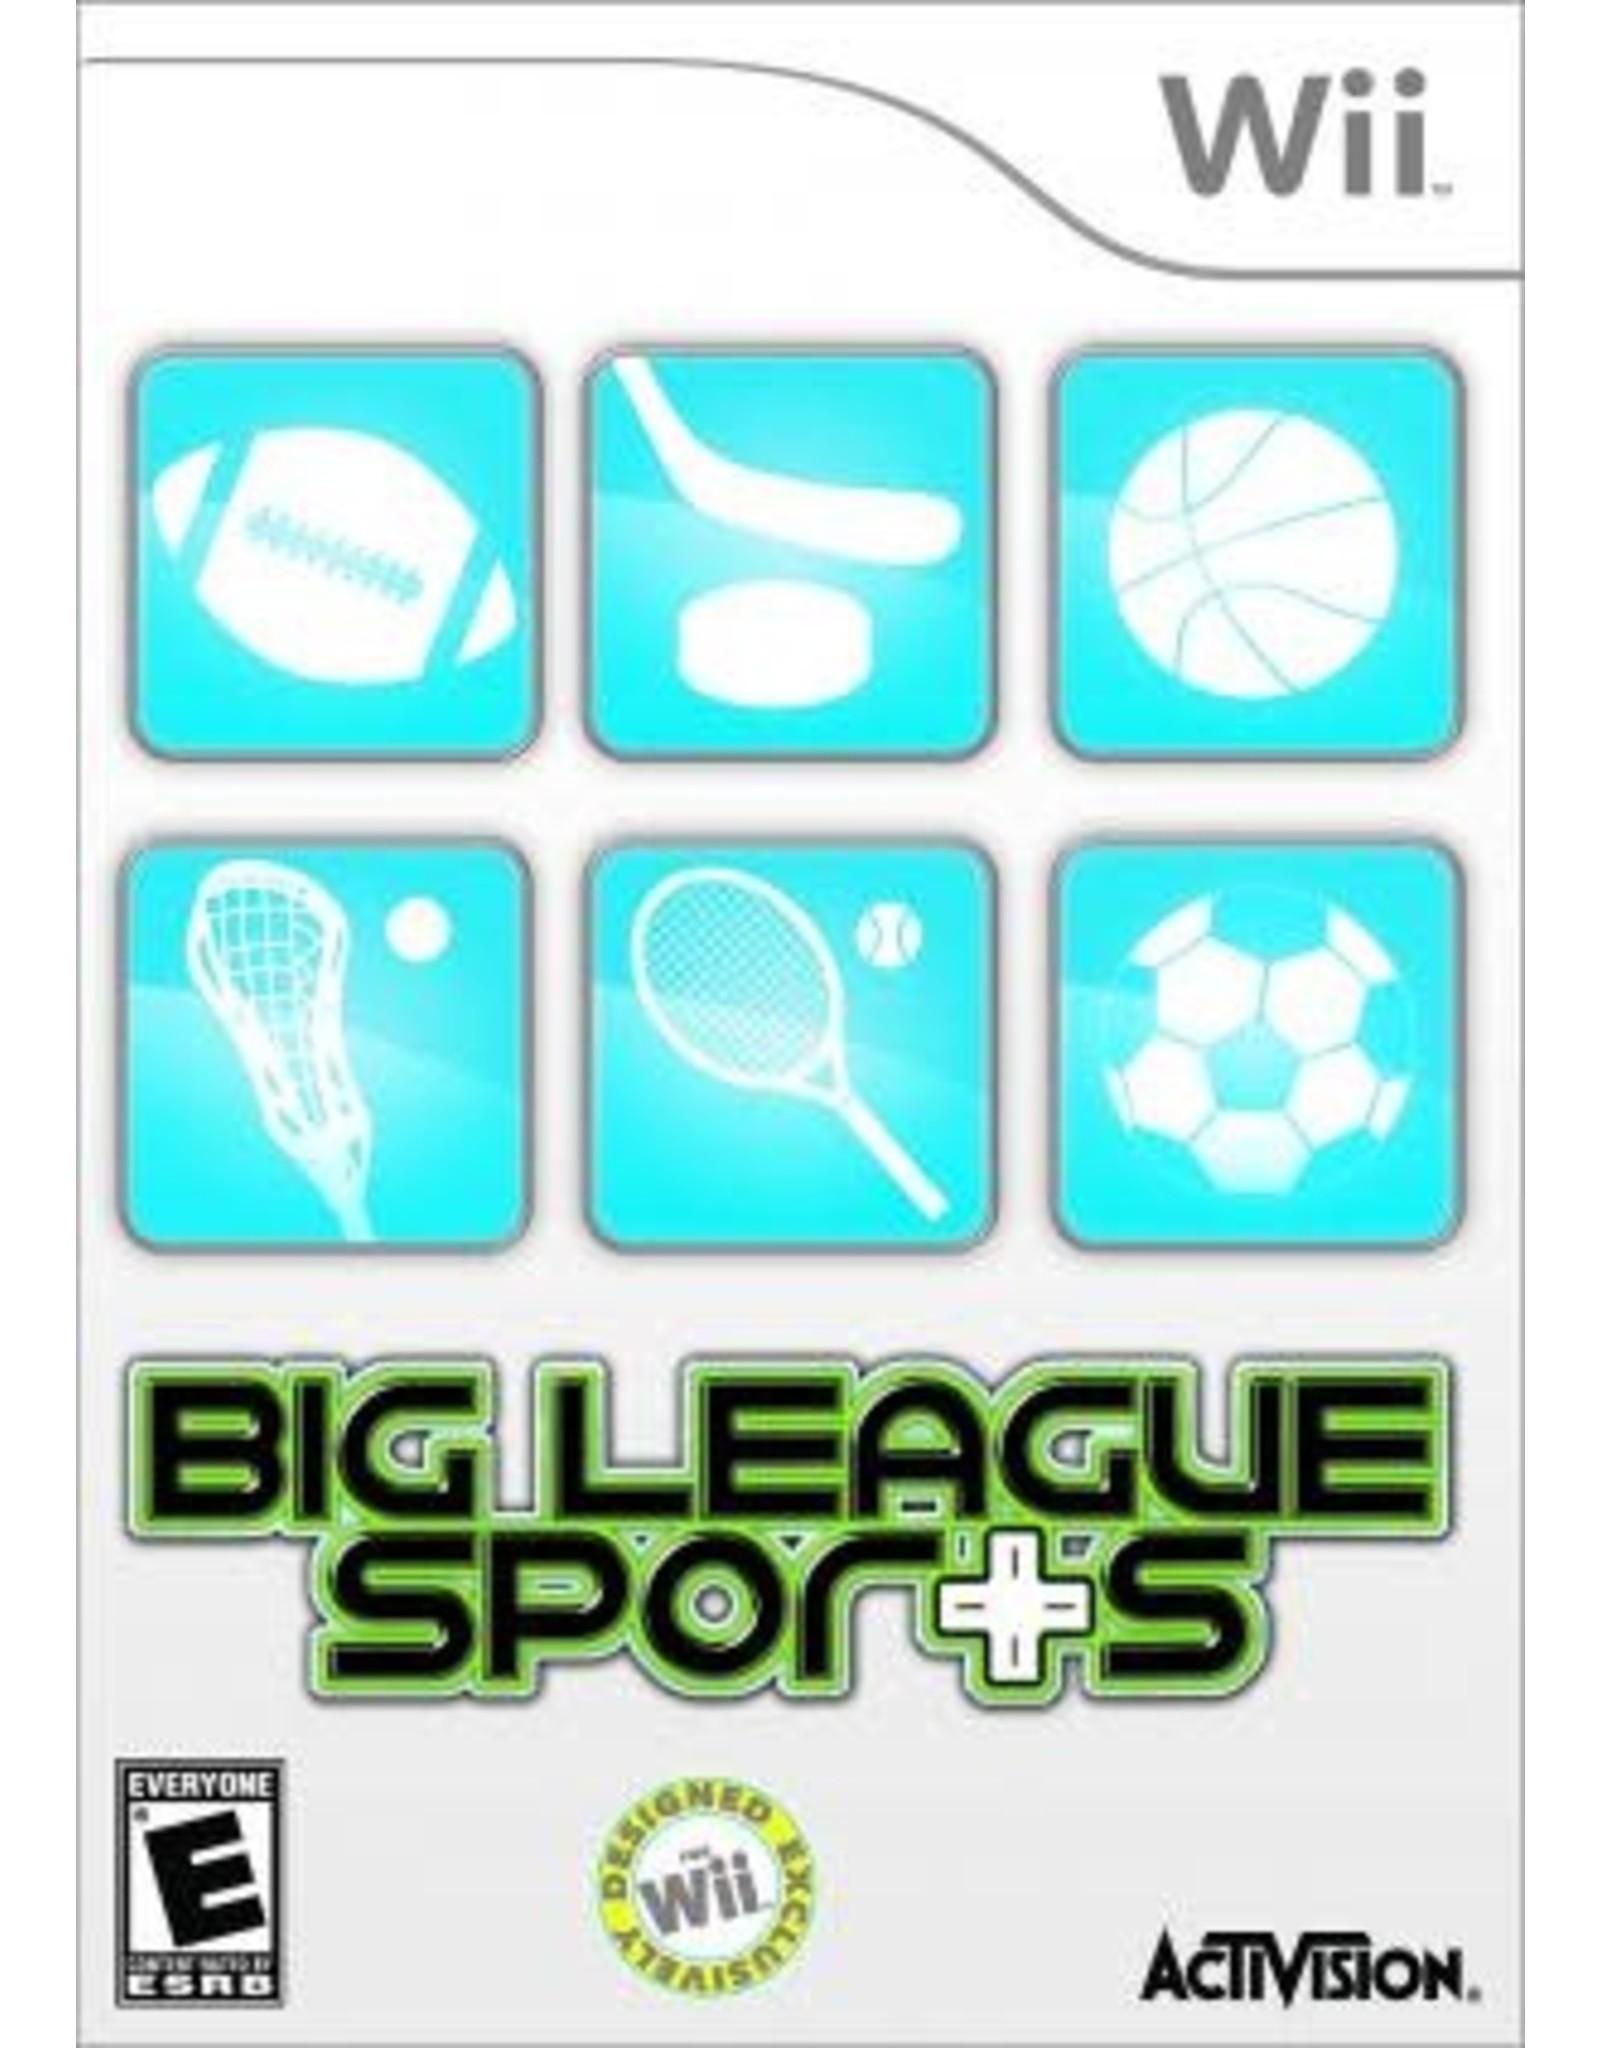 Wii Big League Sports (CiB)